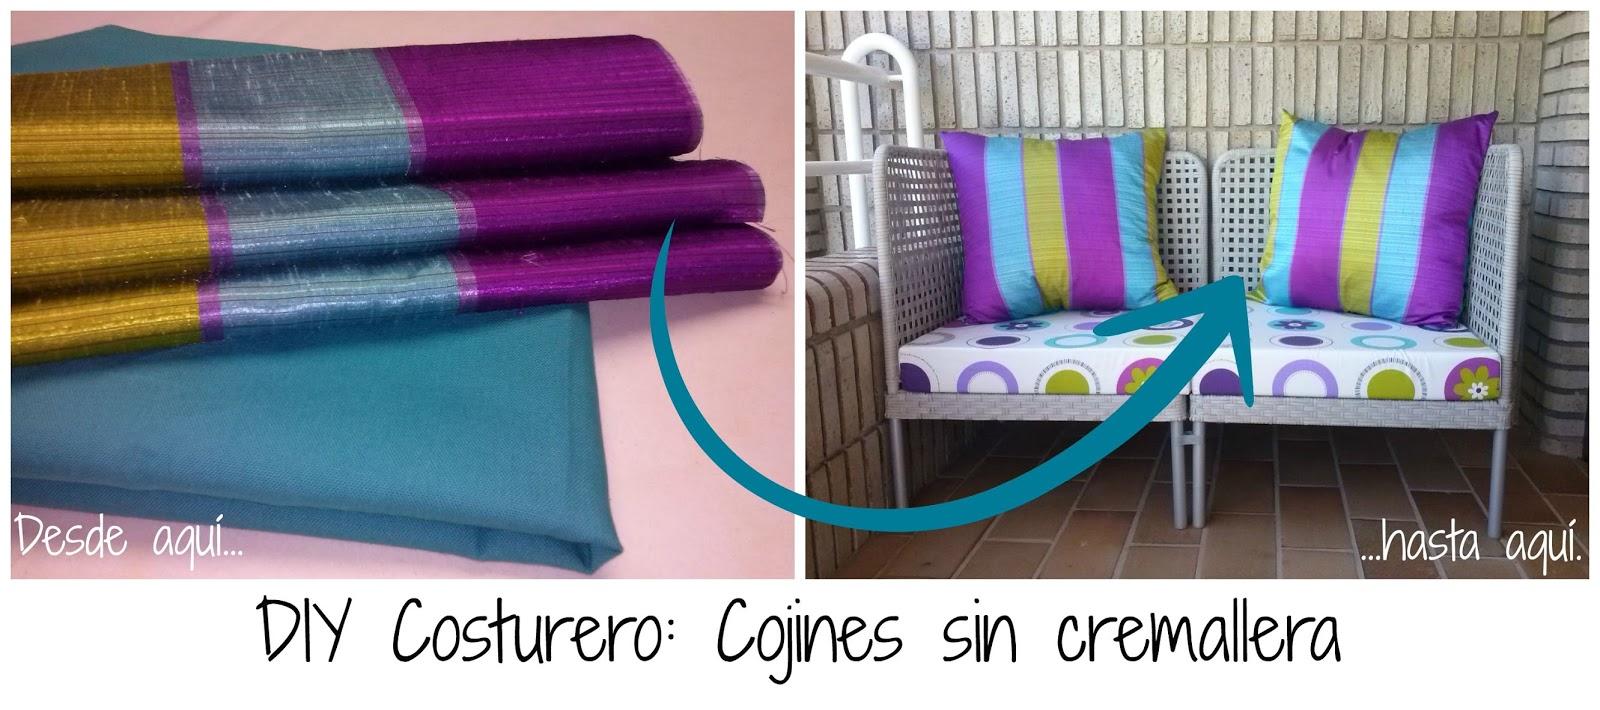 DIY COSTURERO: COJINES SIN CREMALLERA